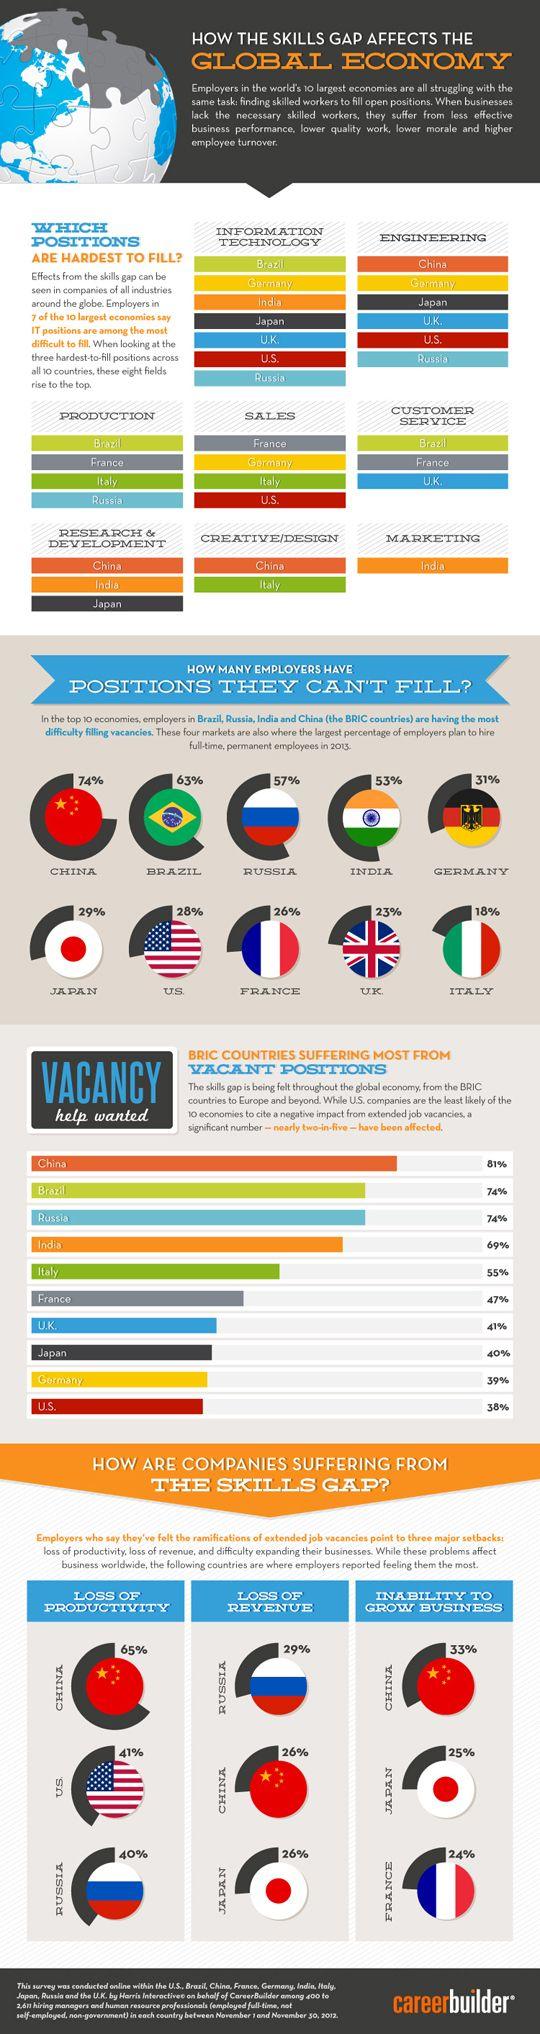 MSN Careers - Infographic: Skills gap impacting employers across the globe - Career Advice Article